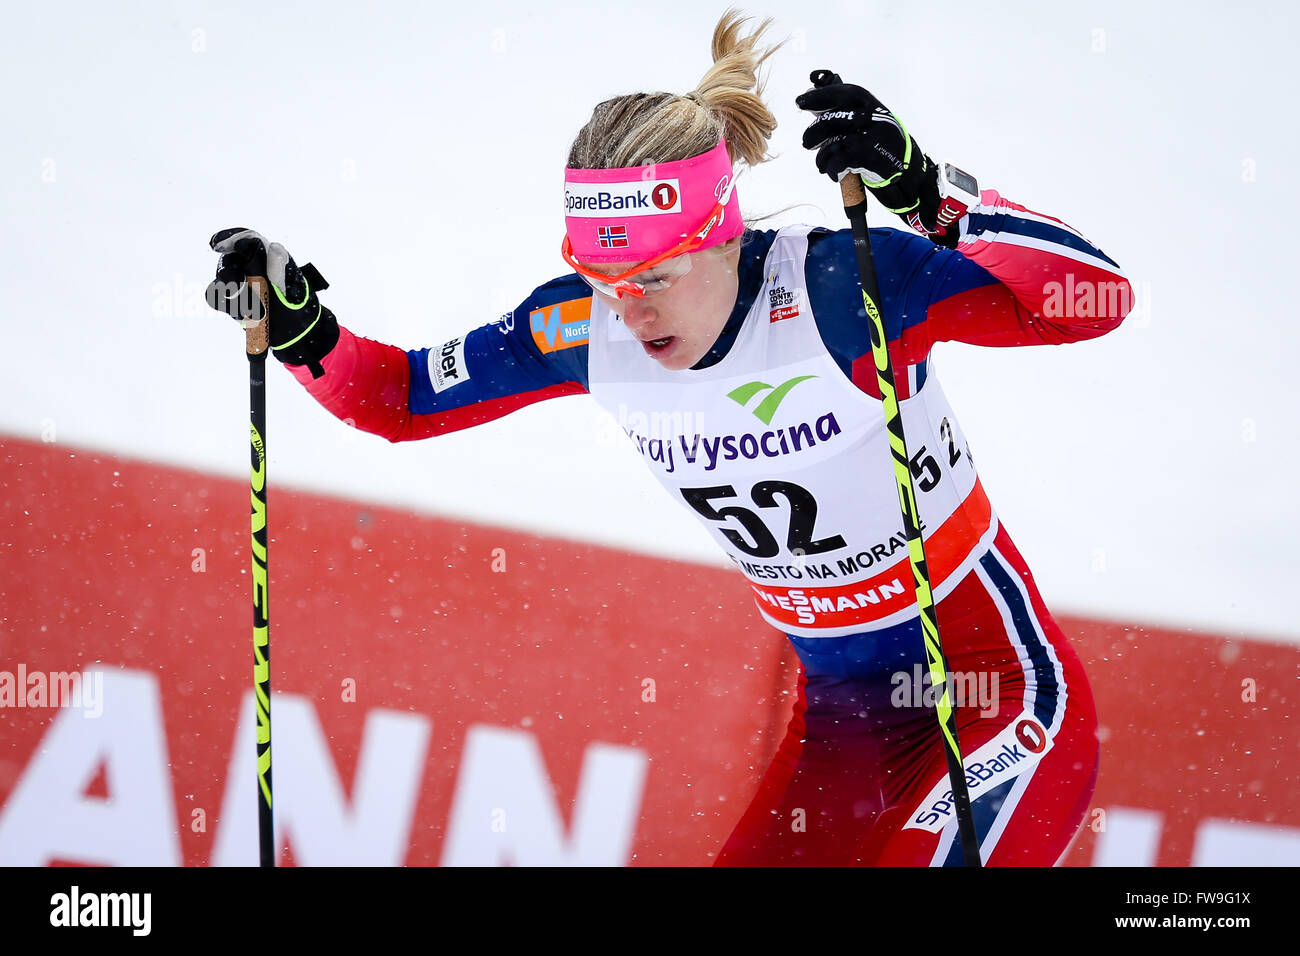 Nove Mesto na Morave, Czech Republic - January 23, 2016: FIS Cross Country World Cup, women 10km. HAGA Ragnhild - Stock Image